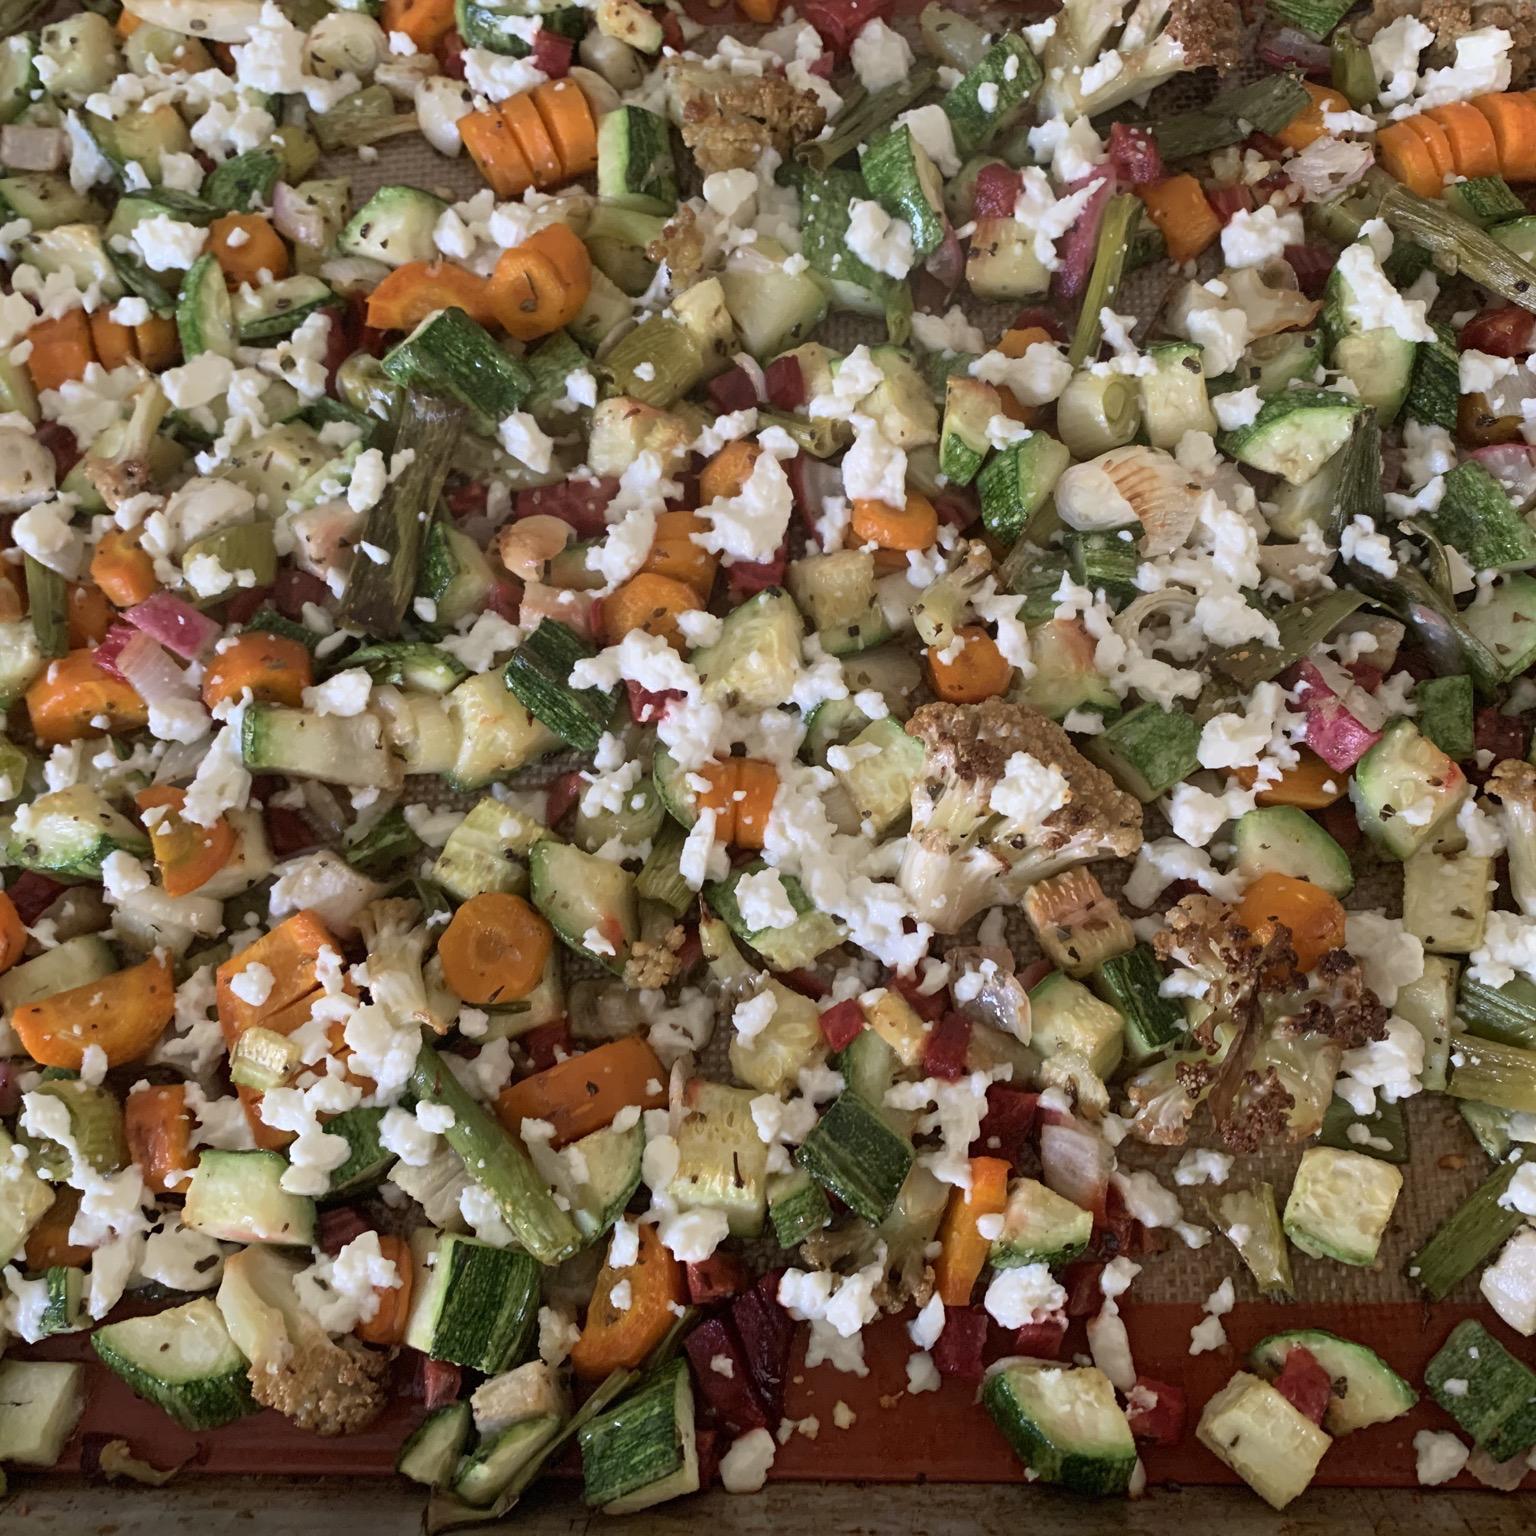 Sheet Pan Vegetable Dinner with Feta barbara